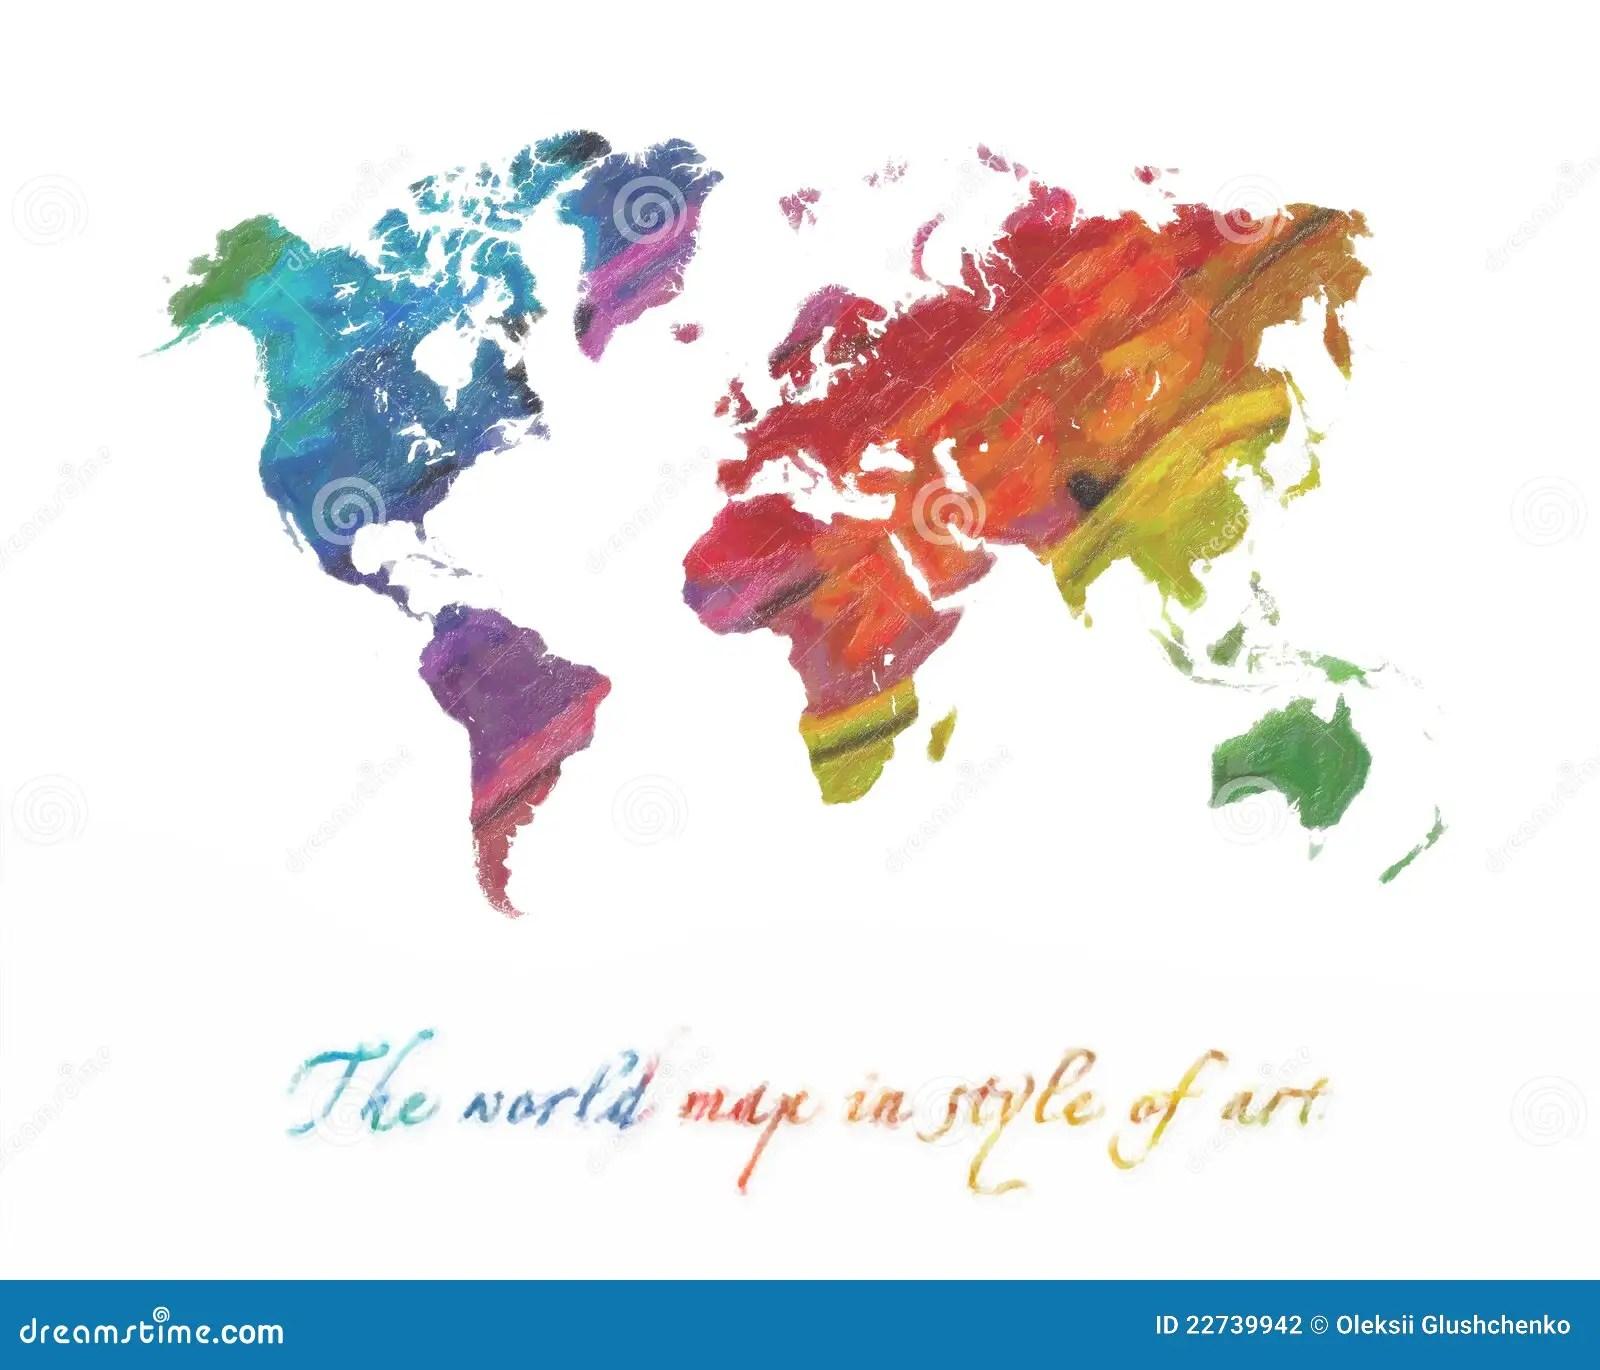 University Of Miami Wallpaper Hd World Map Multi Colored Stock Illustration Image Of